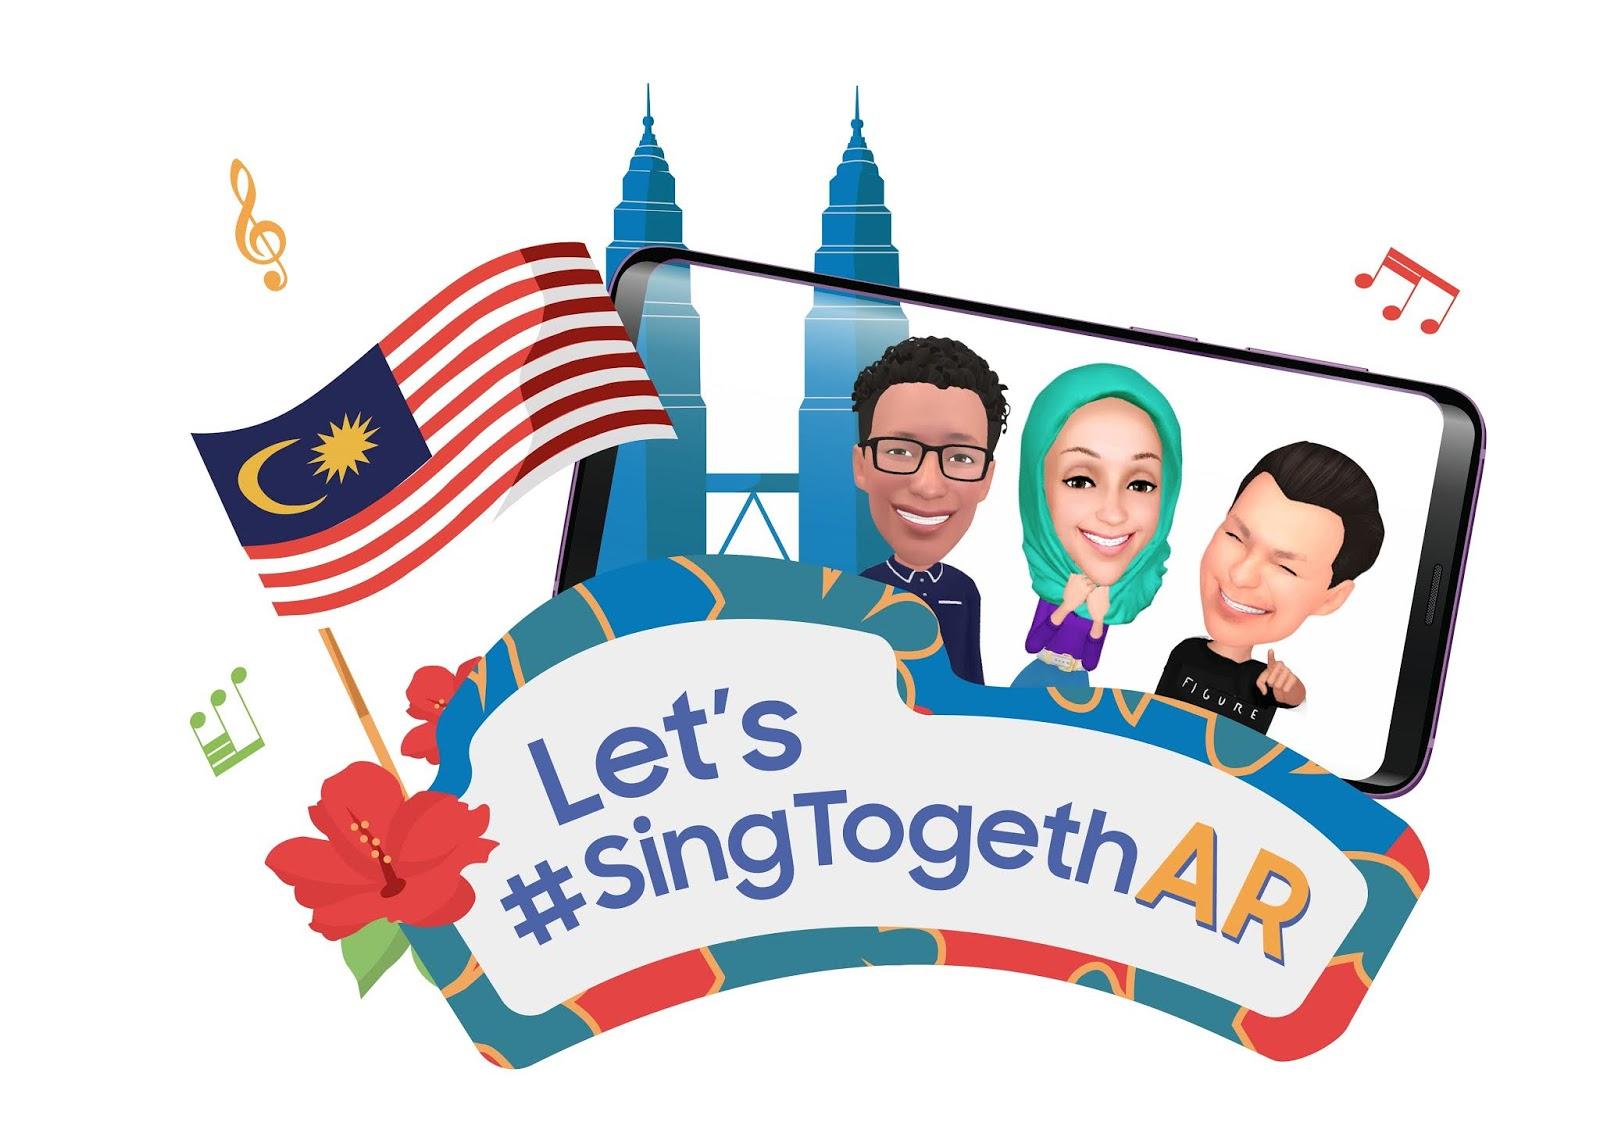 Sing 'Rasa Sayang' With The Samsung Galaxy S9 | S9+ #SingTogethAR